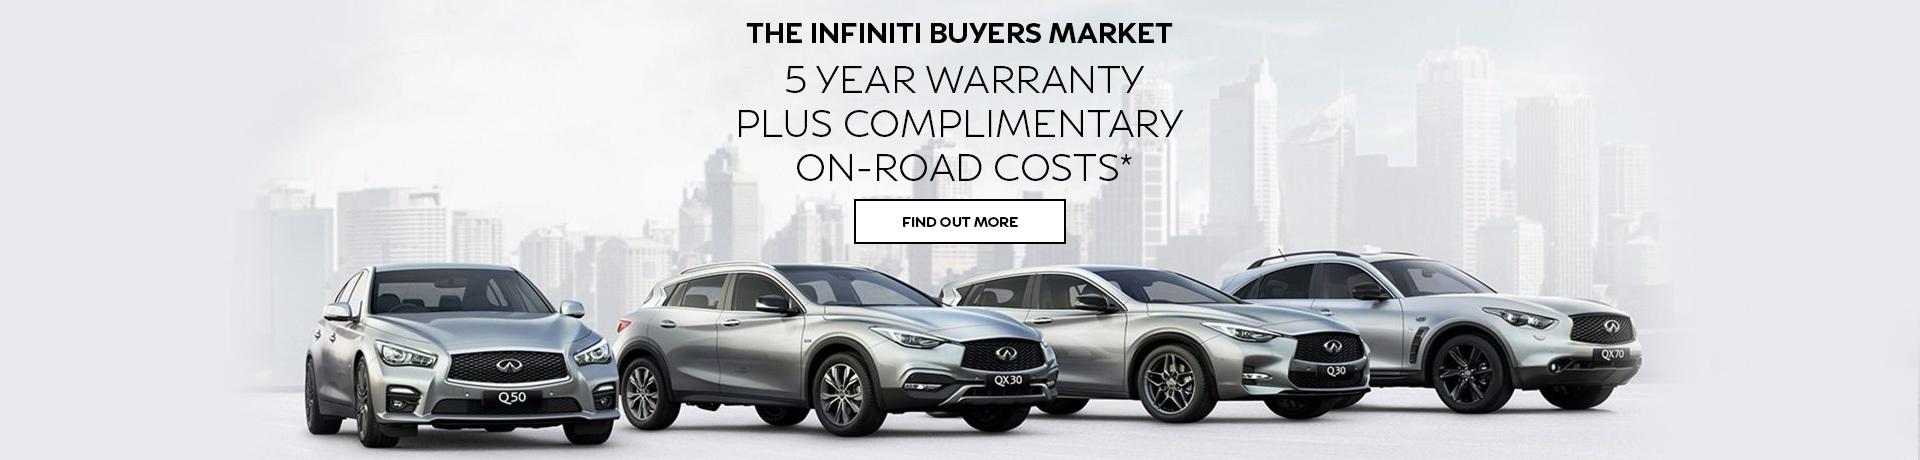 Infiniti - National Offer - Infiniti Buyers Market - 5 Year Warranty PLus Compli